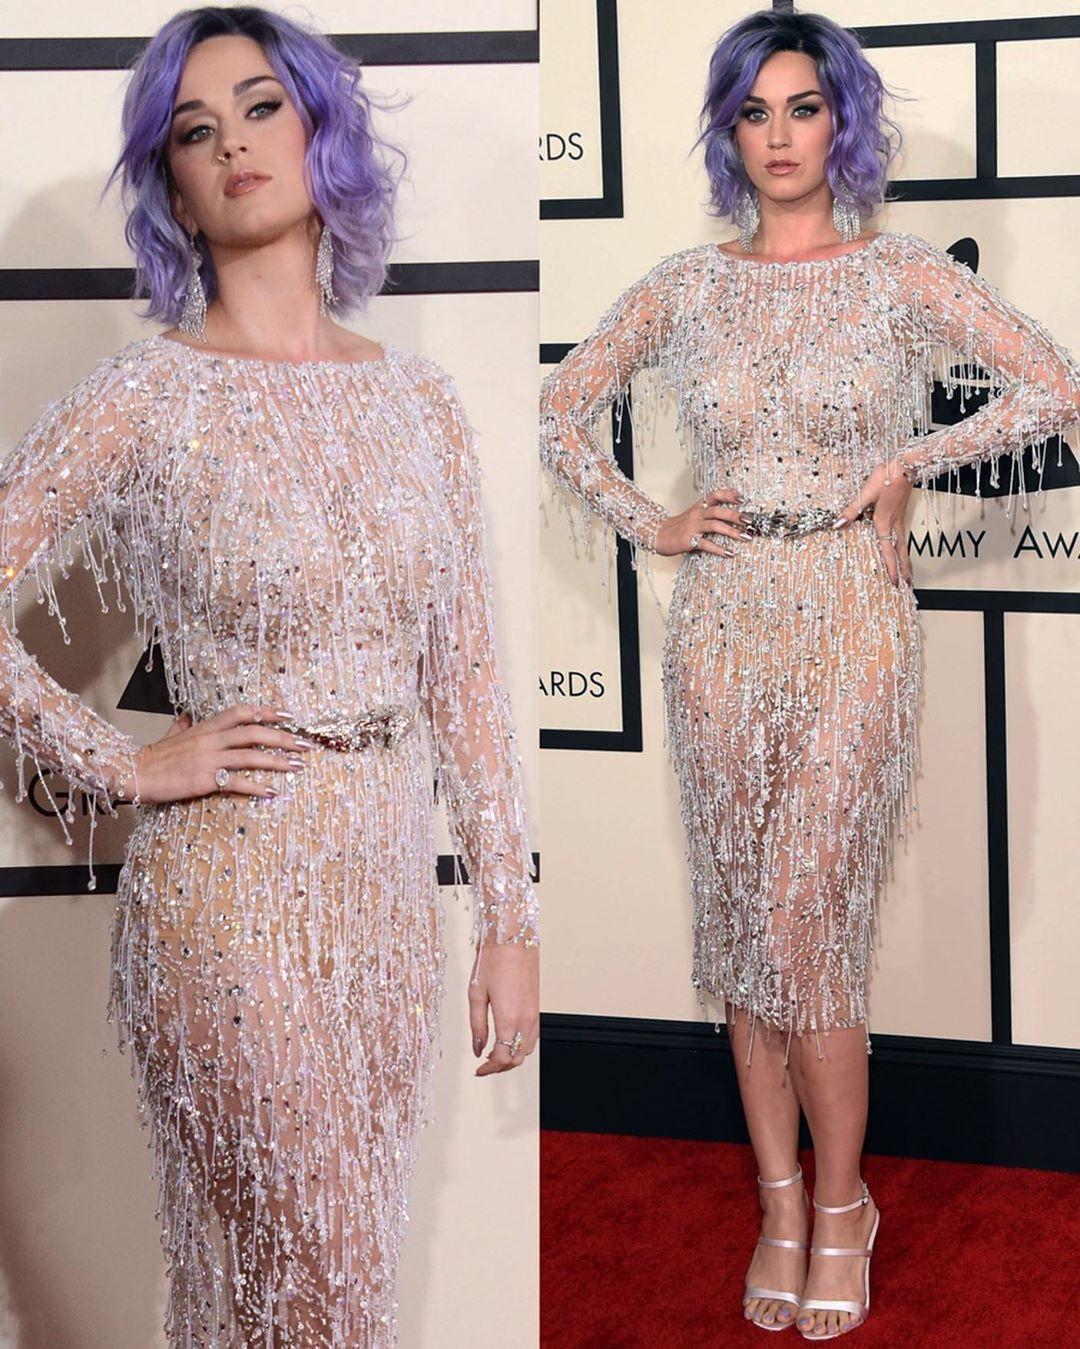 Light Purple Sequin & Beads Tassel Short Dress with Long Sleeves.